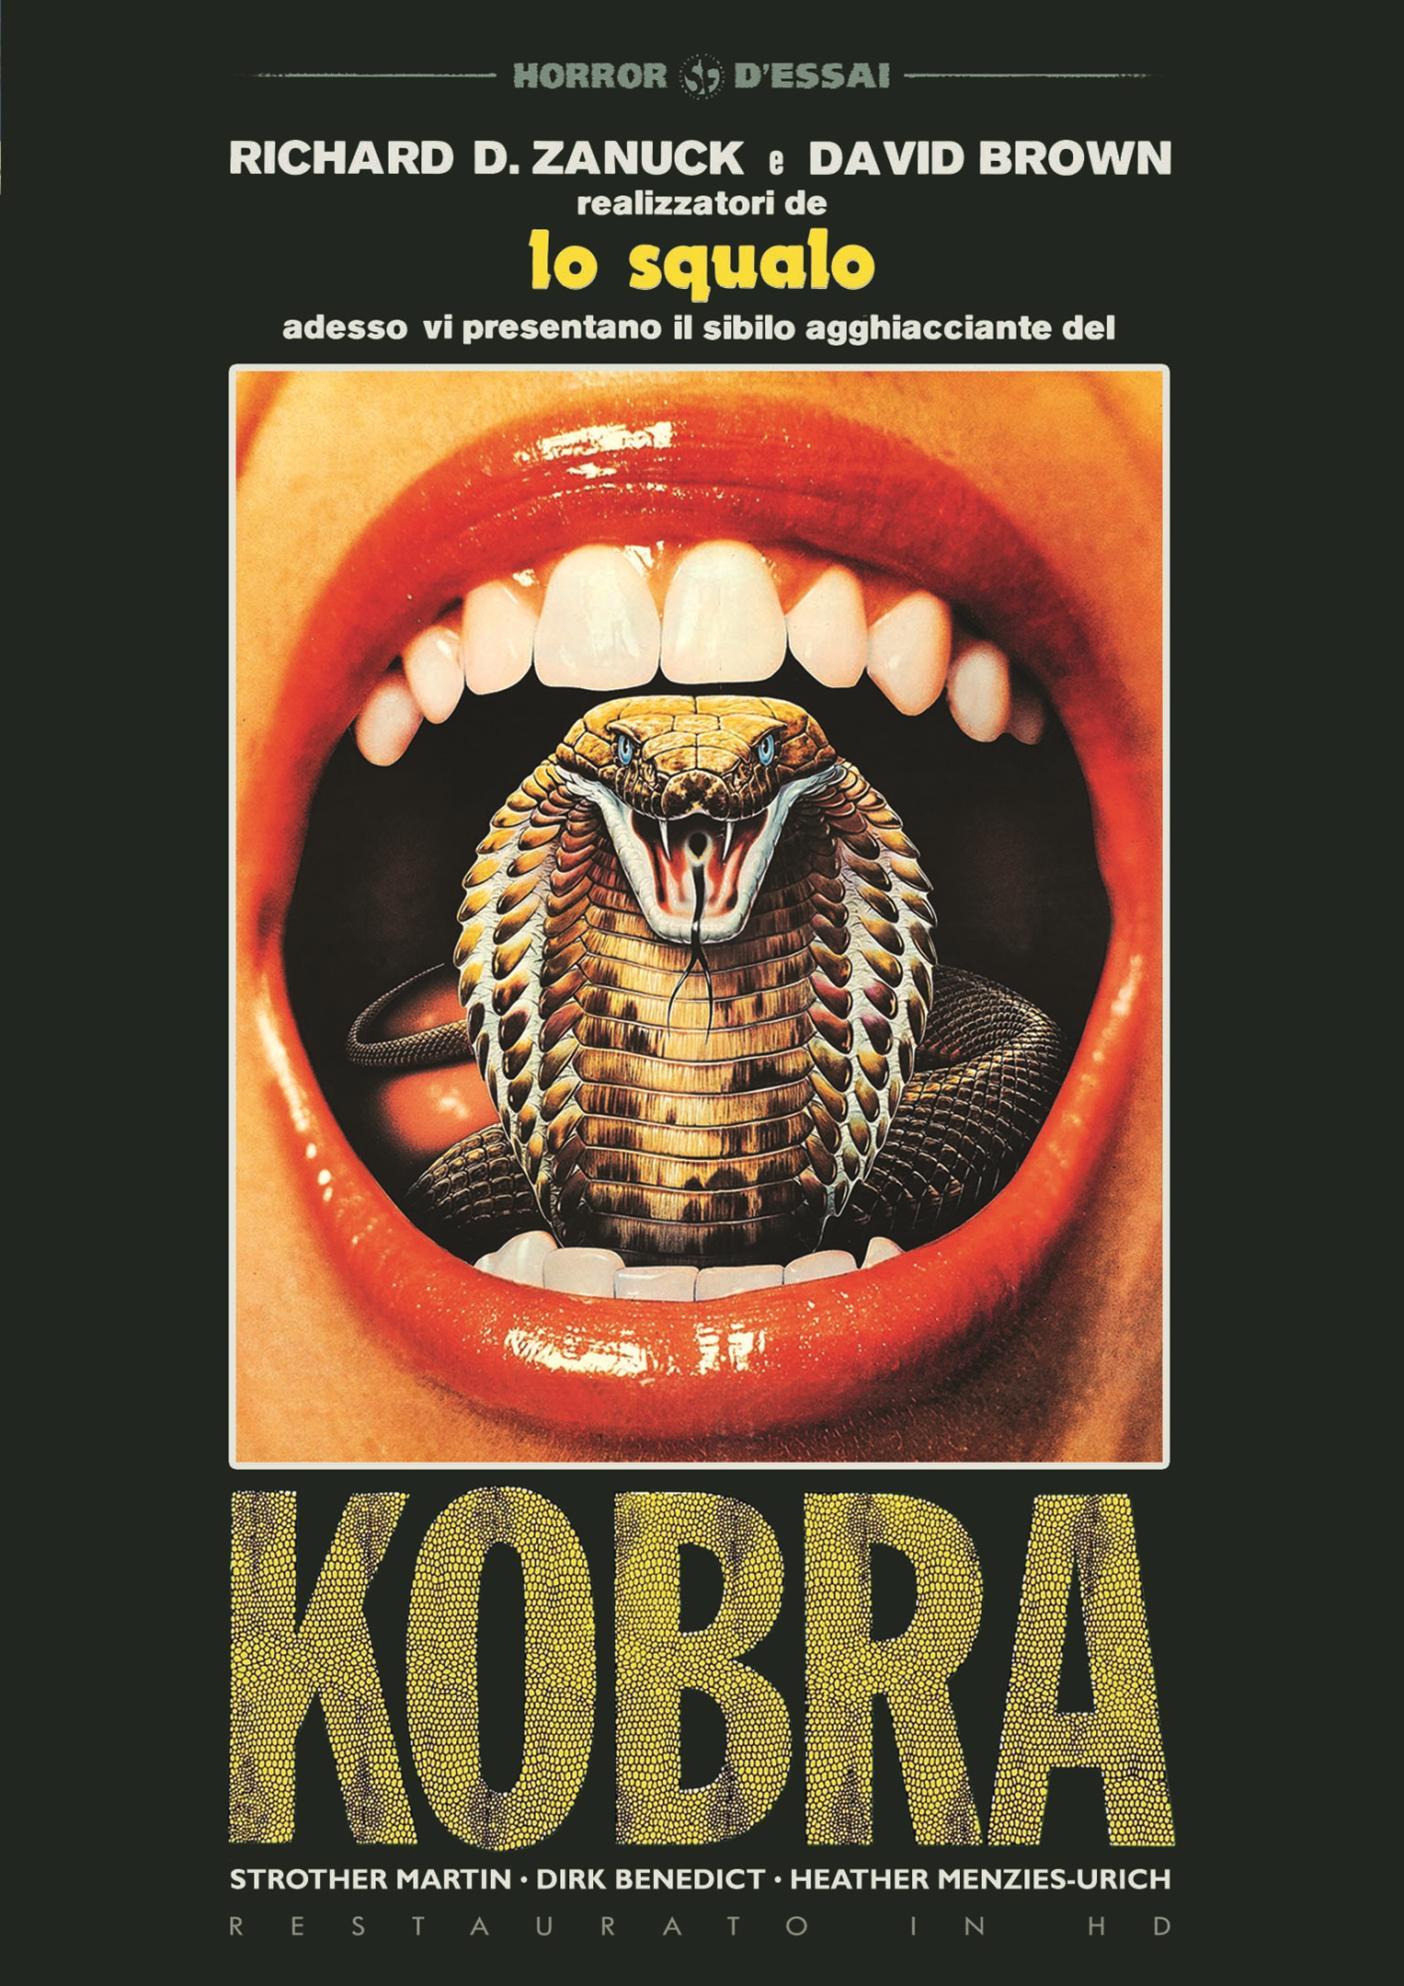 KOBRA (RESTAURATO IN HD) (DVD)